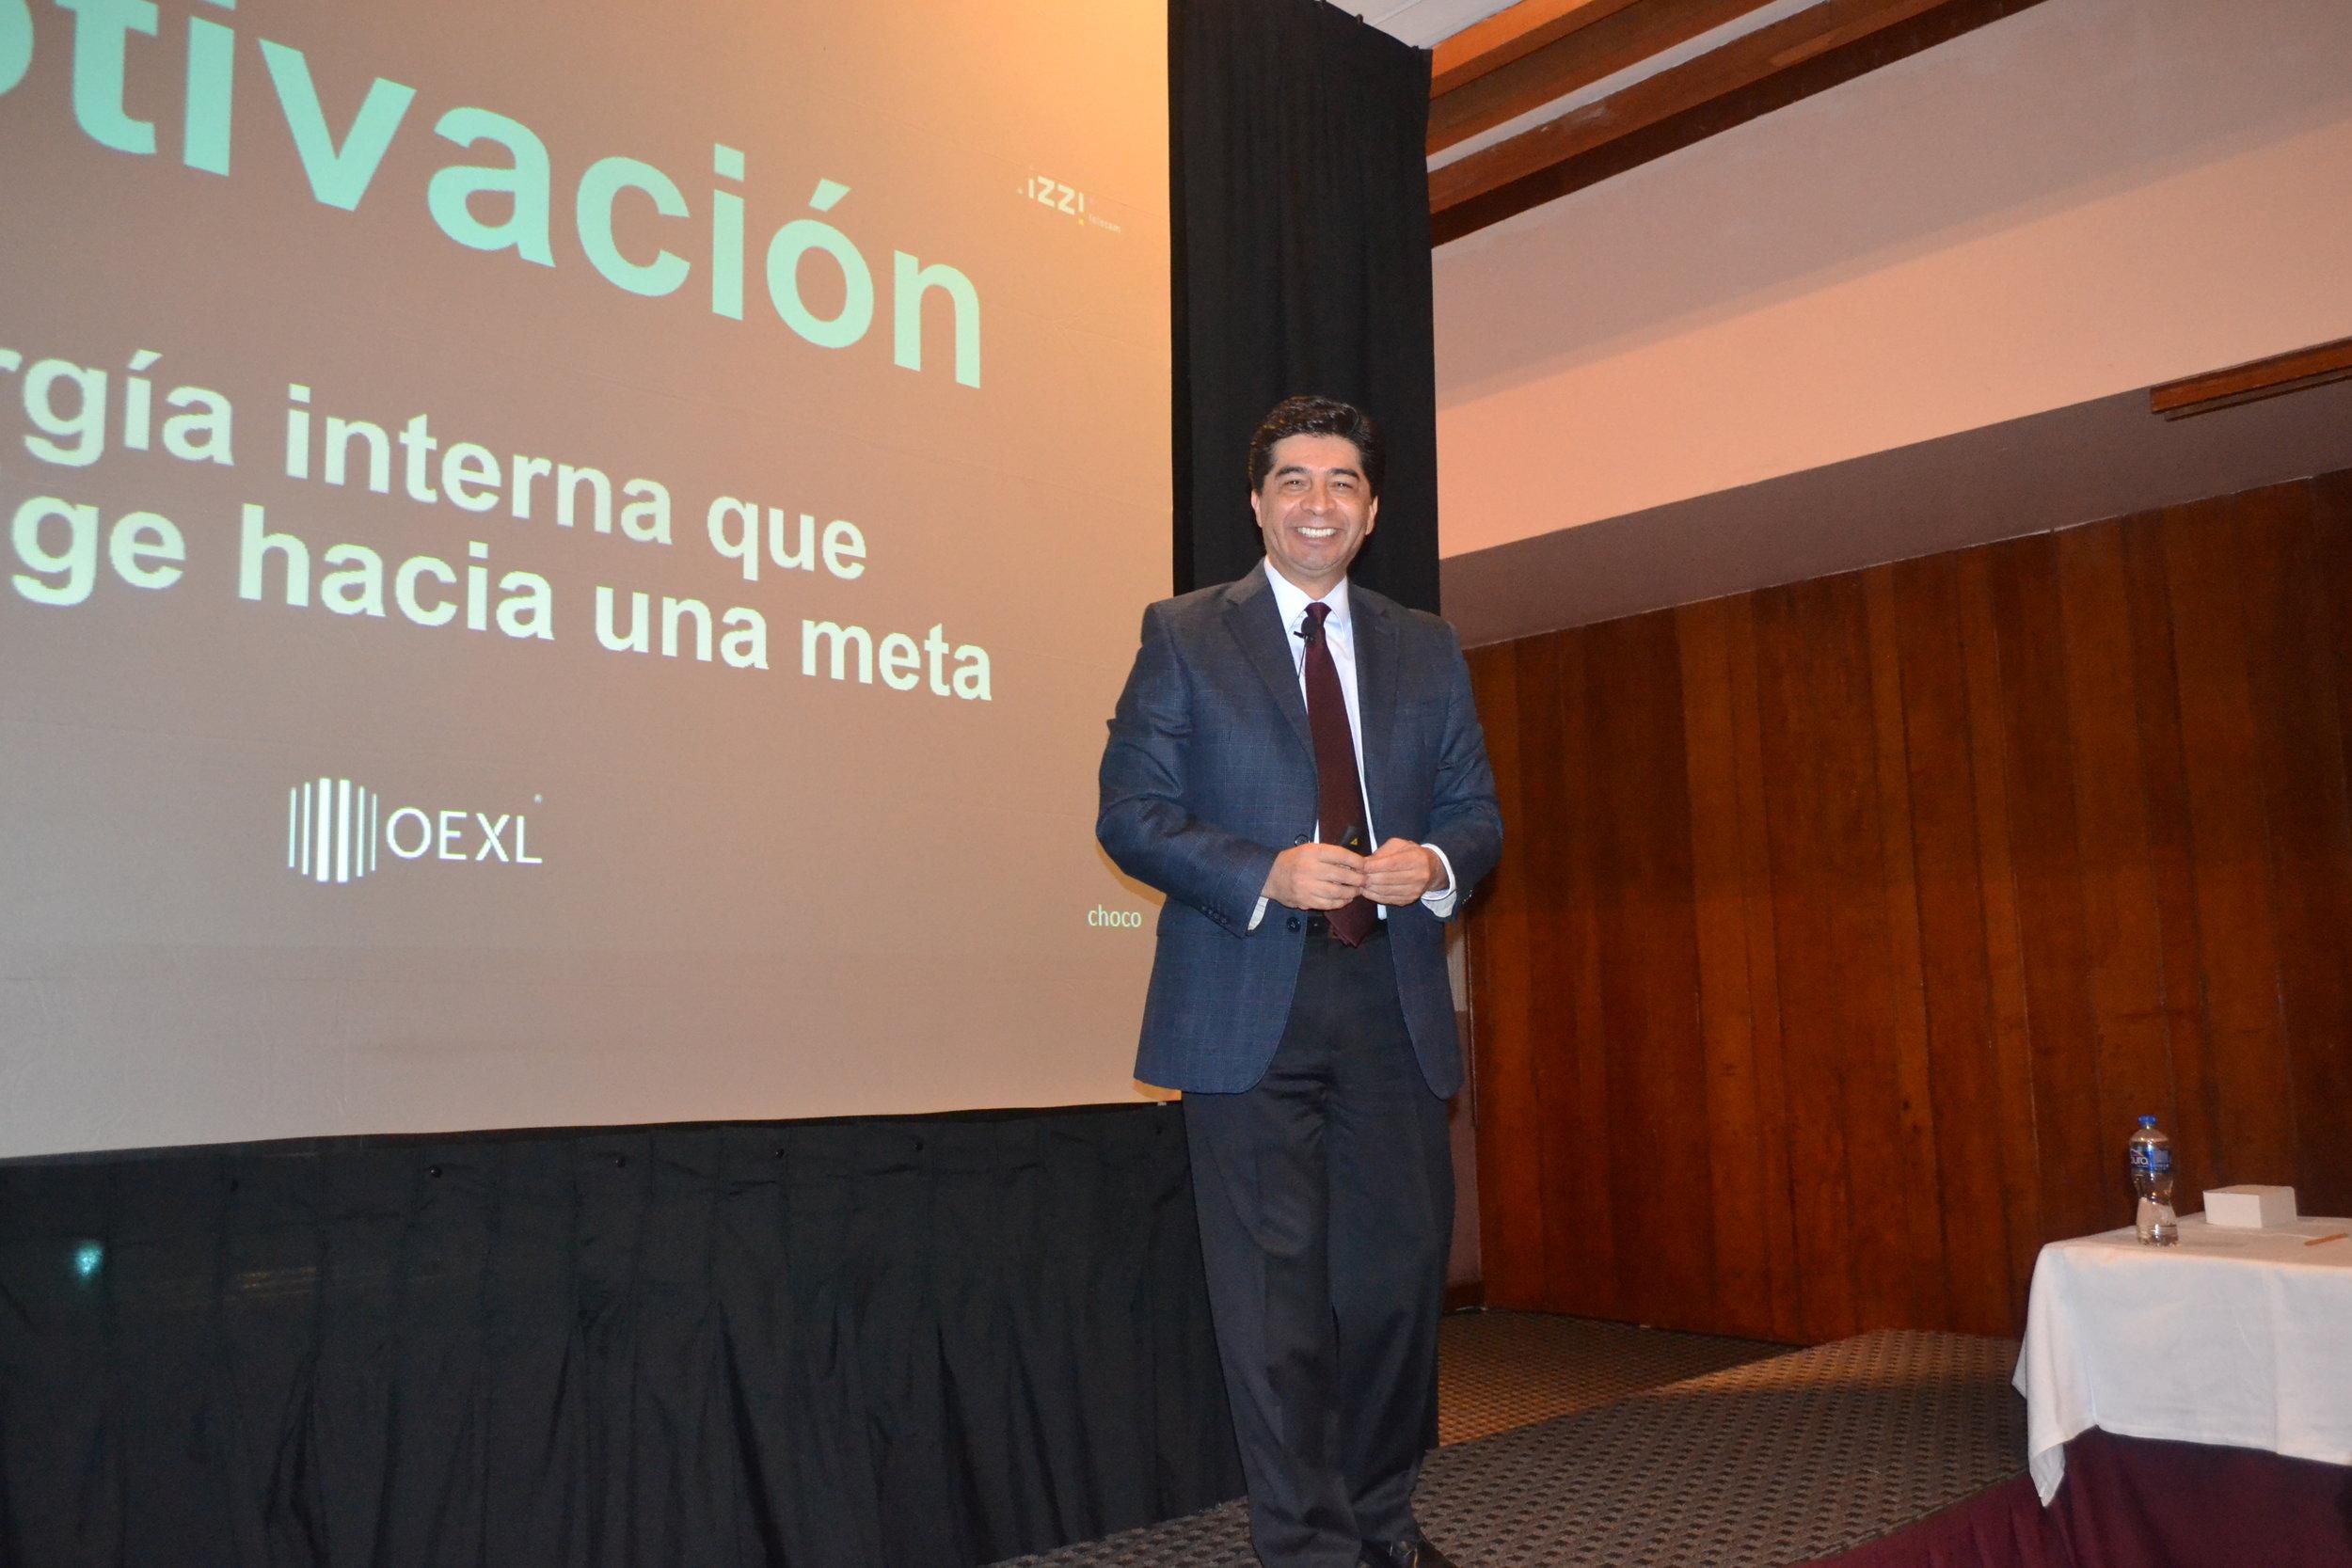 92 Empresa_Telecomunicaciones_Conferencia (2).JPG